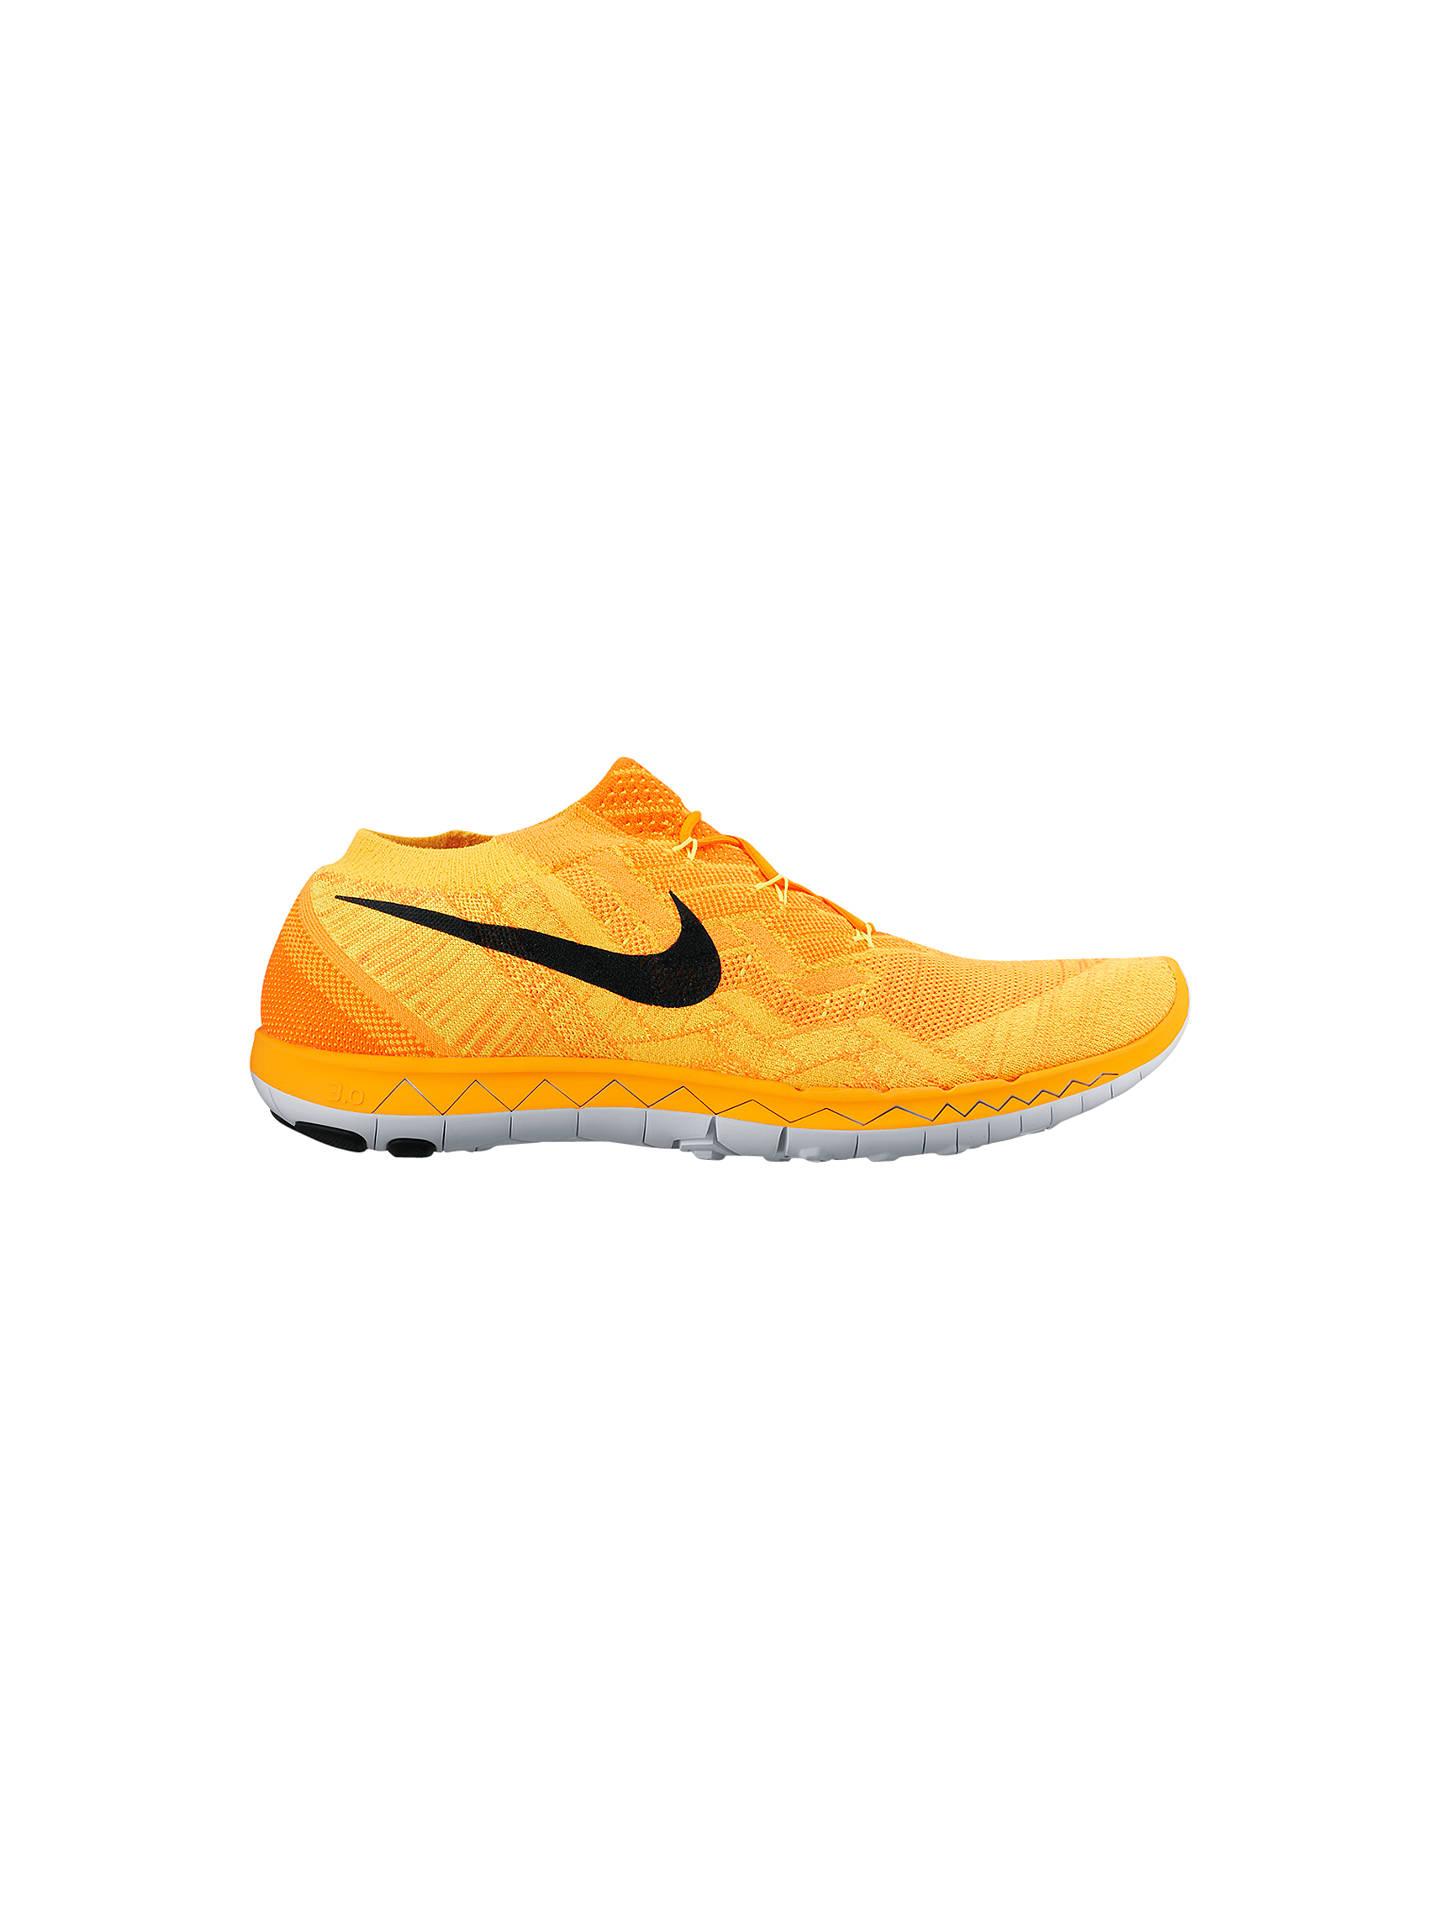 separation shoes e8e4f 8fa0e Buy Nike Free 3.0 Flyknit Men s Running Shoes, Orange Black, 6.5 Online at  ...